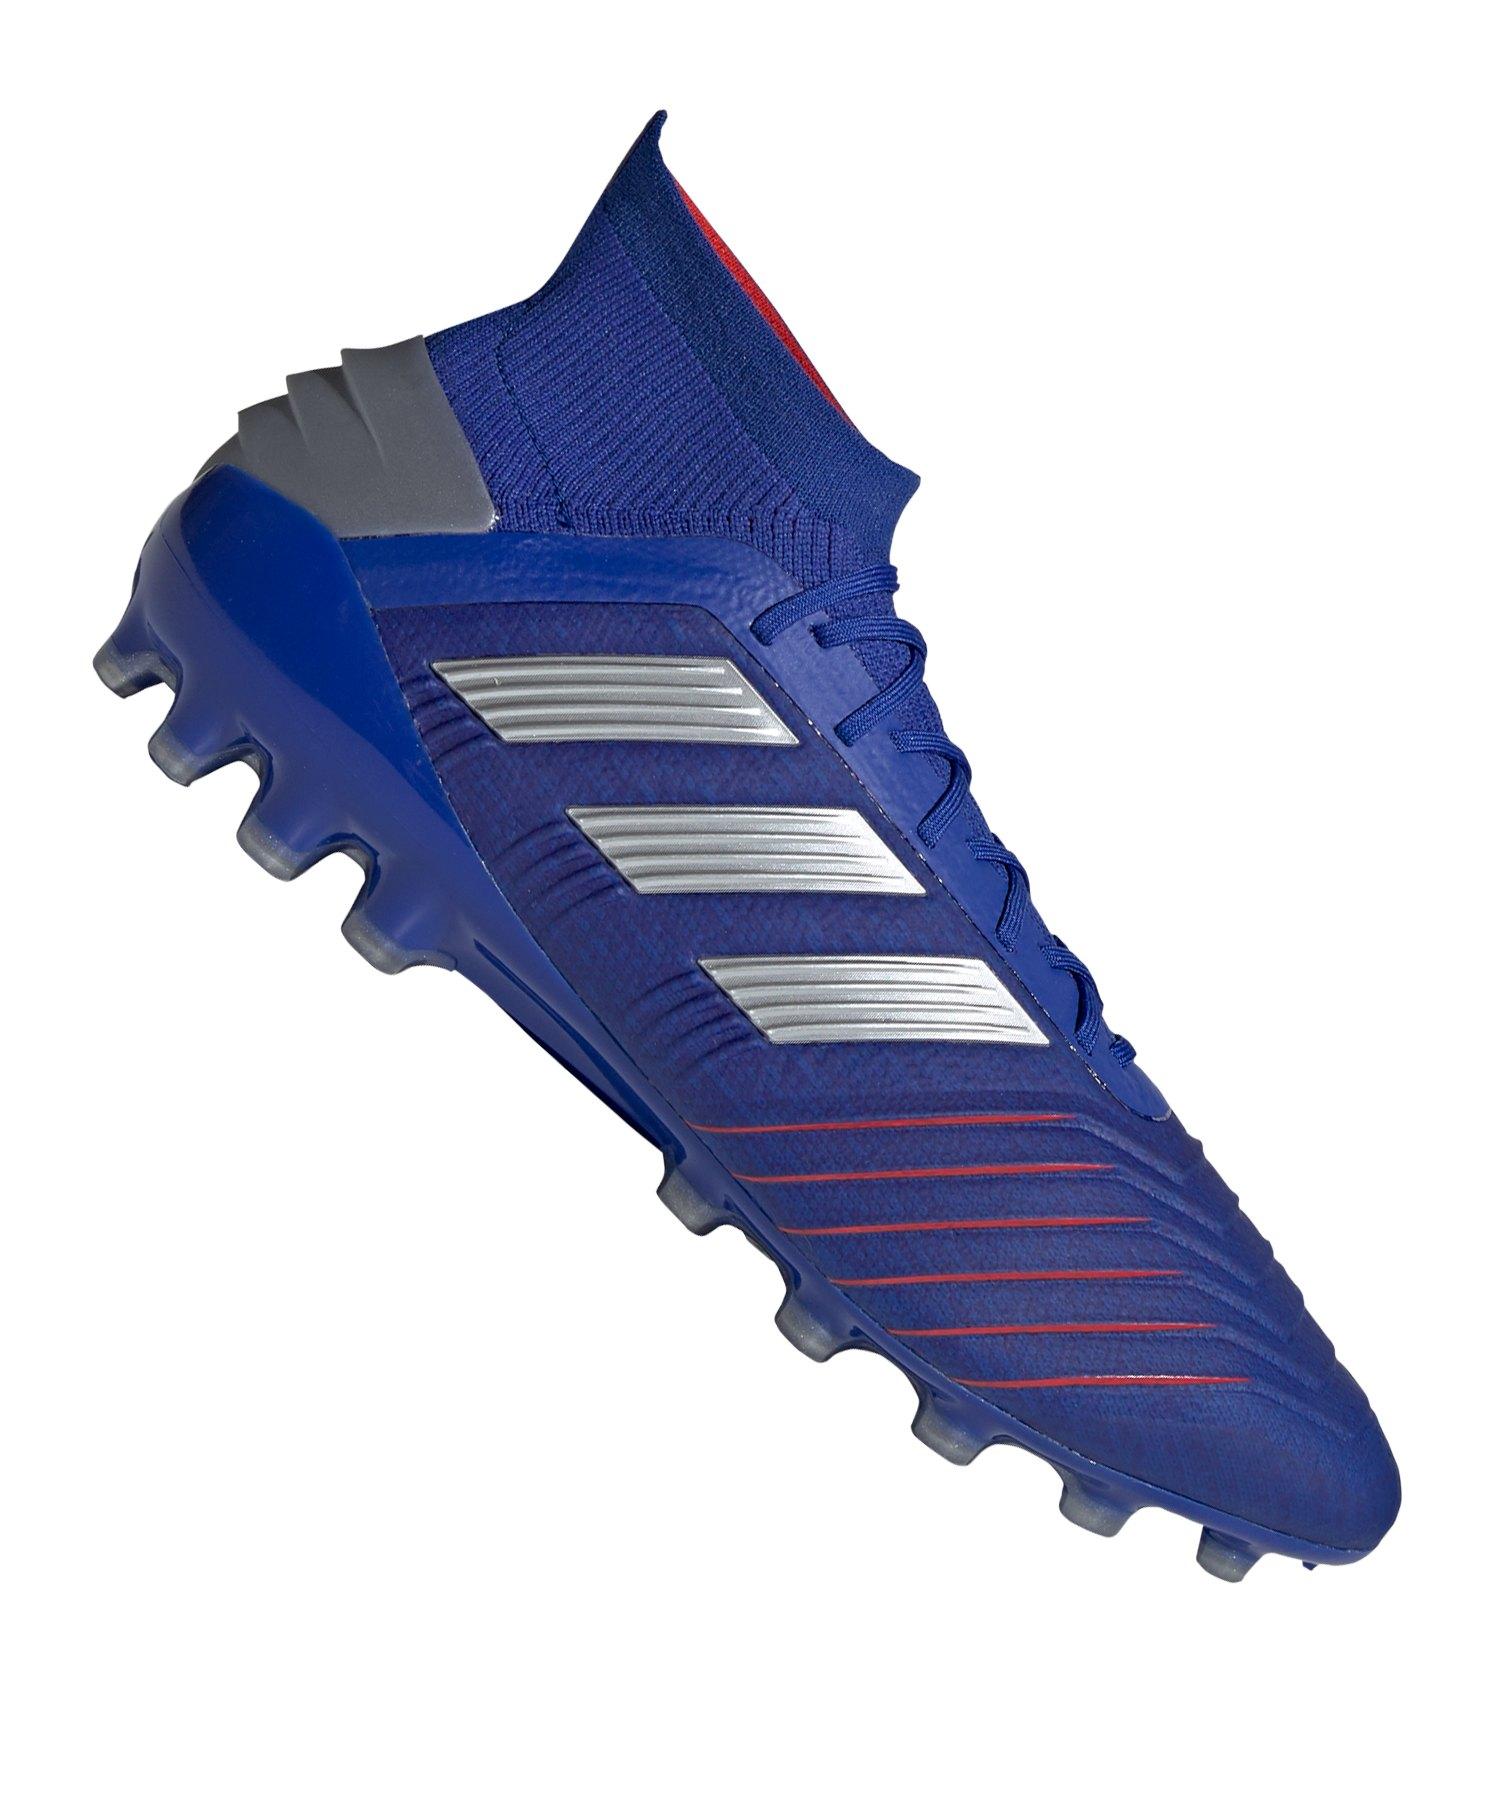 adidas Predator 19.1 AG Blau Silber - blau